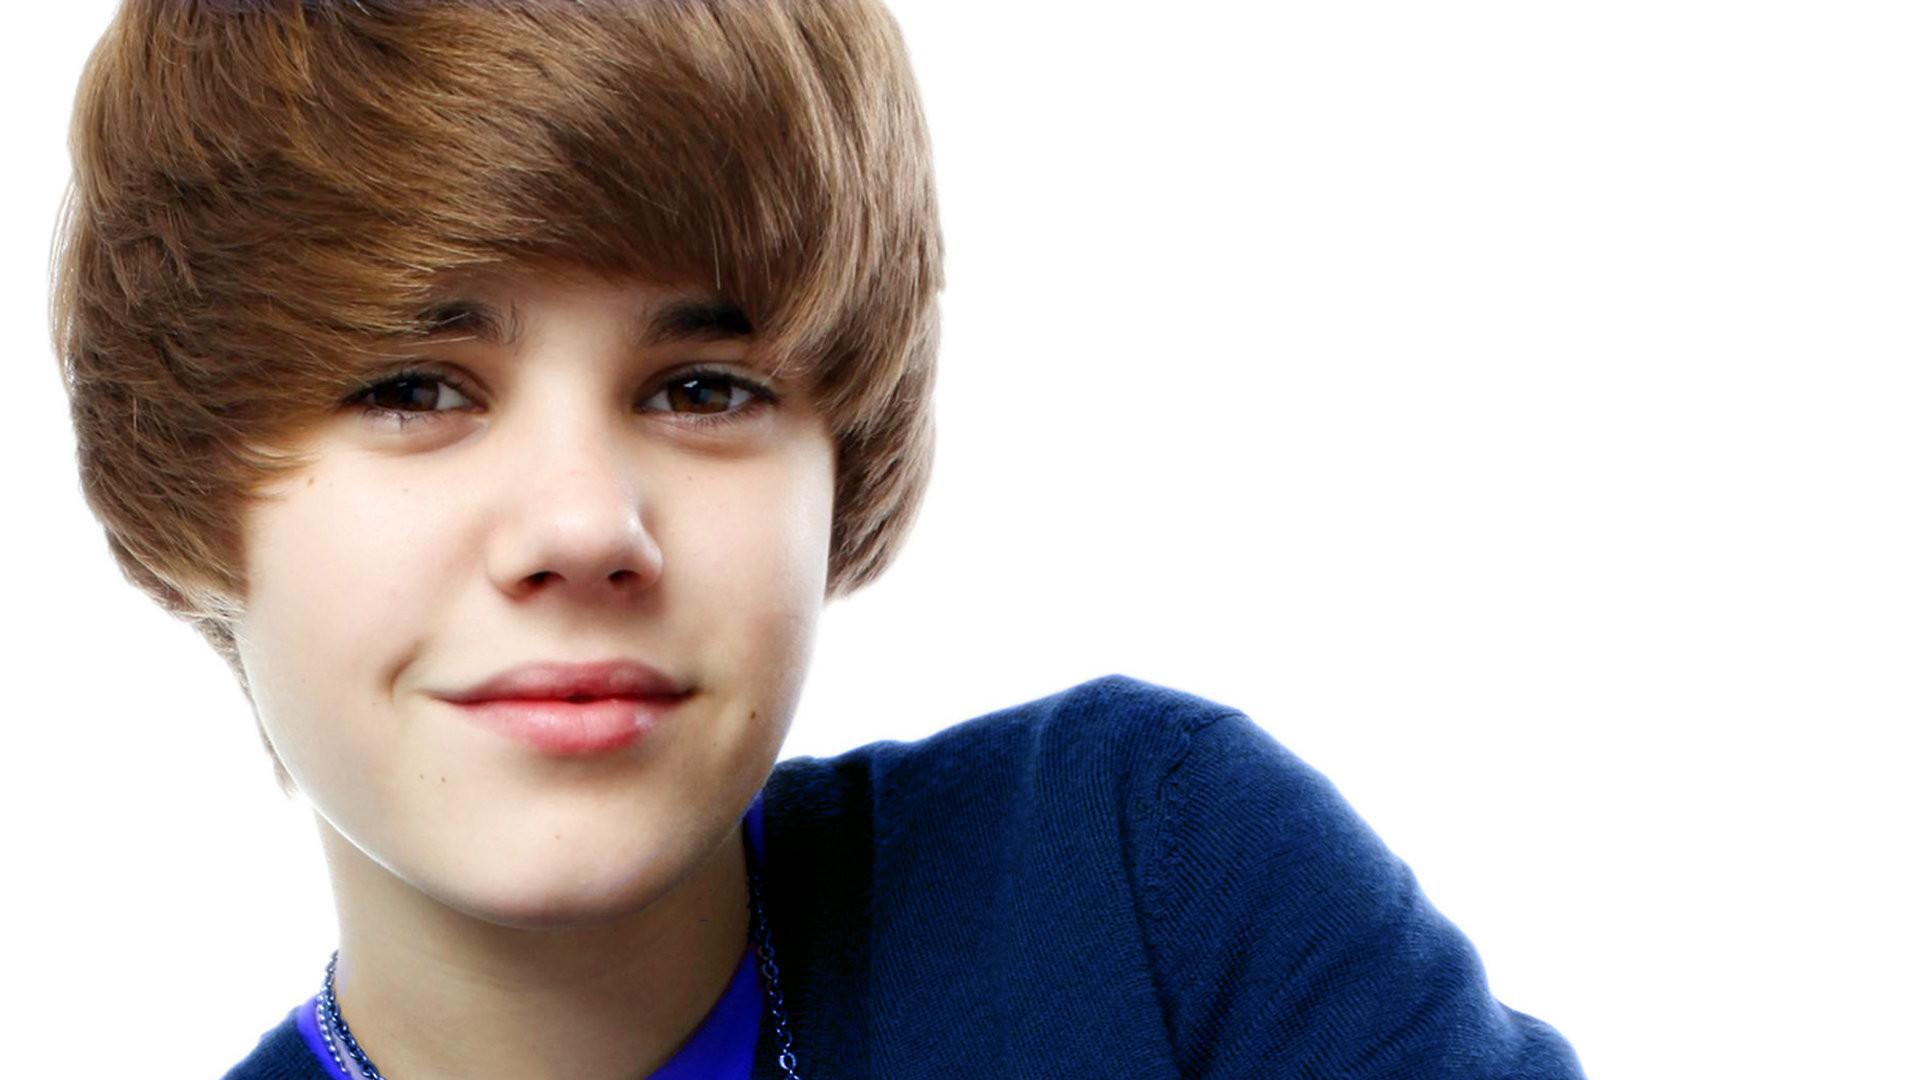 Justin Bieber HD Wallpaper (64+ images)